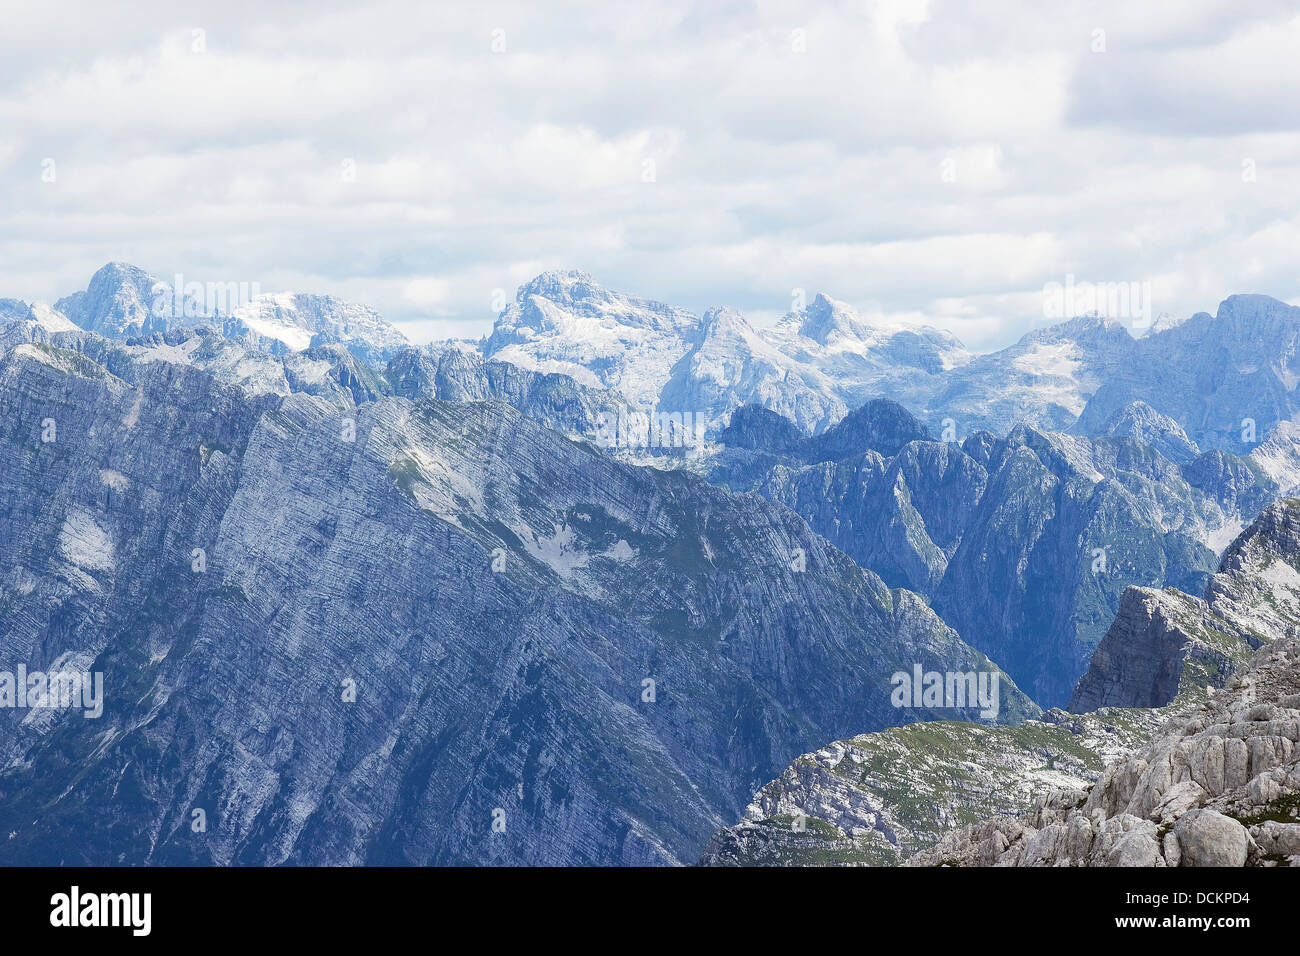 Julian Alps in the summer, Slovenia - Stock Image